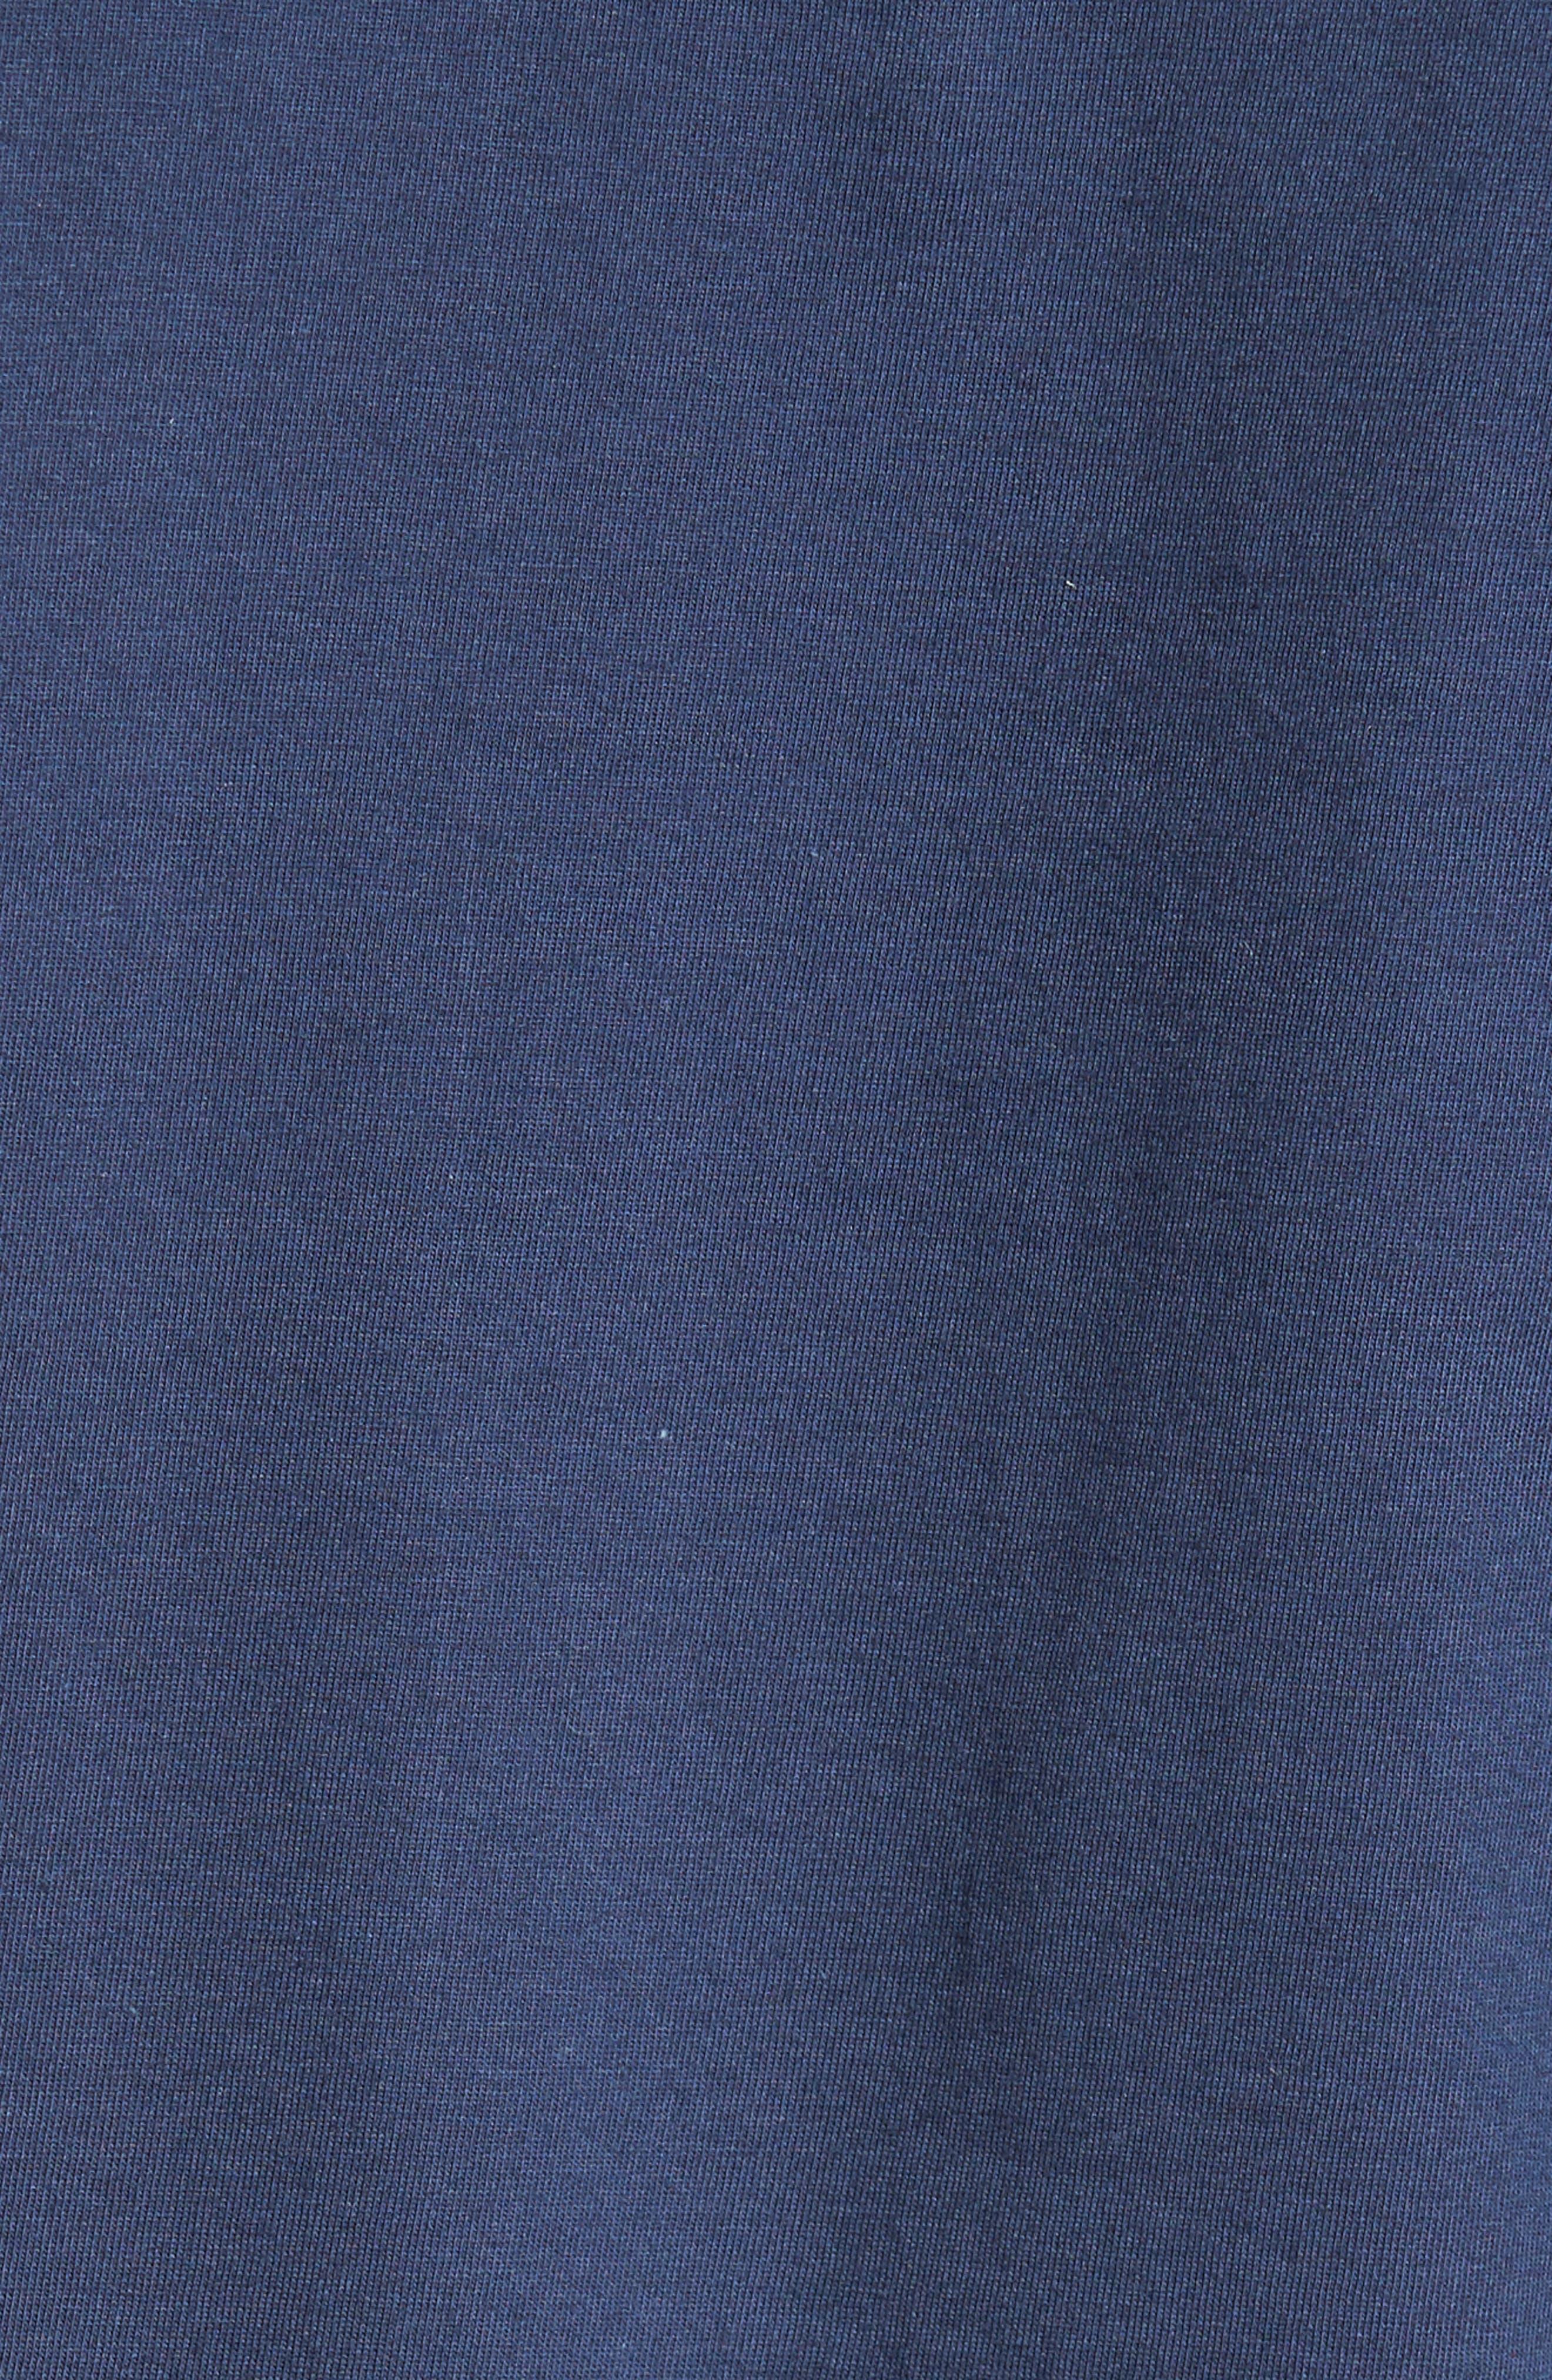 Glitch Motors T-Shirt,                             Alternate thumbnail 5, color,                             Federal Blue